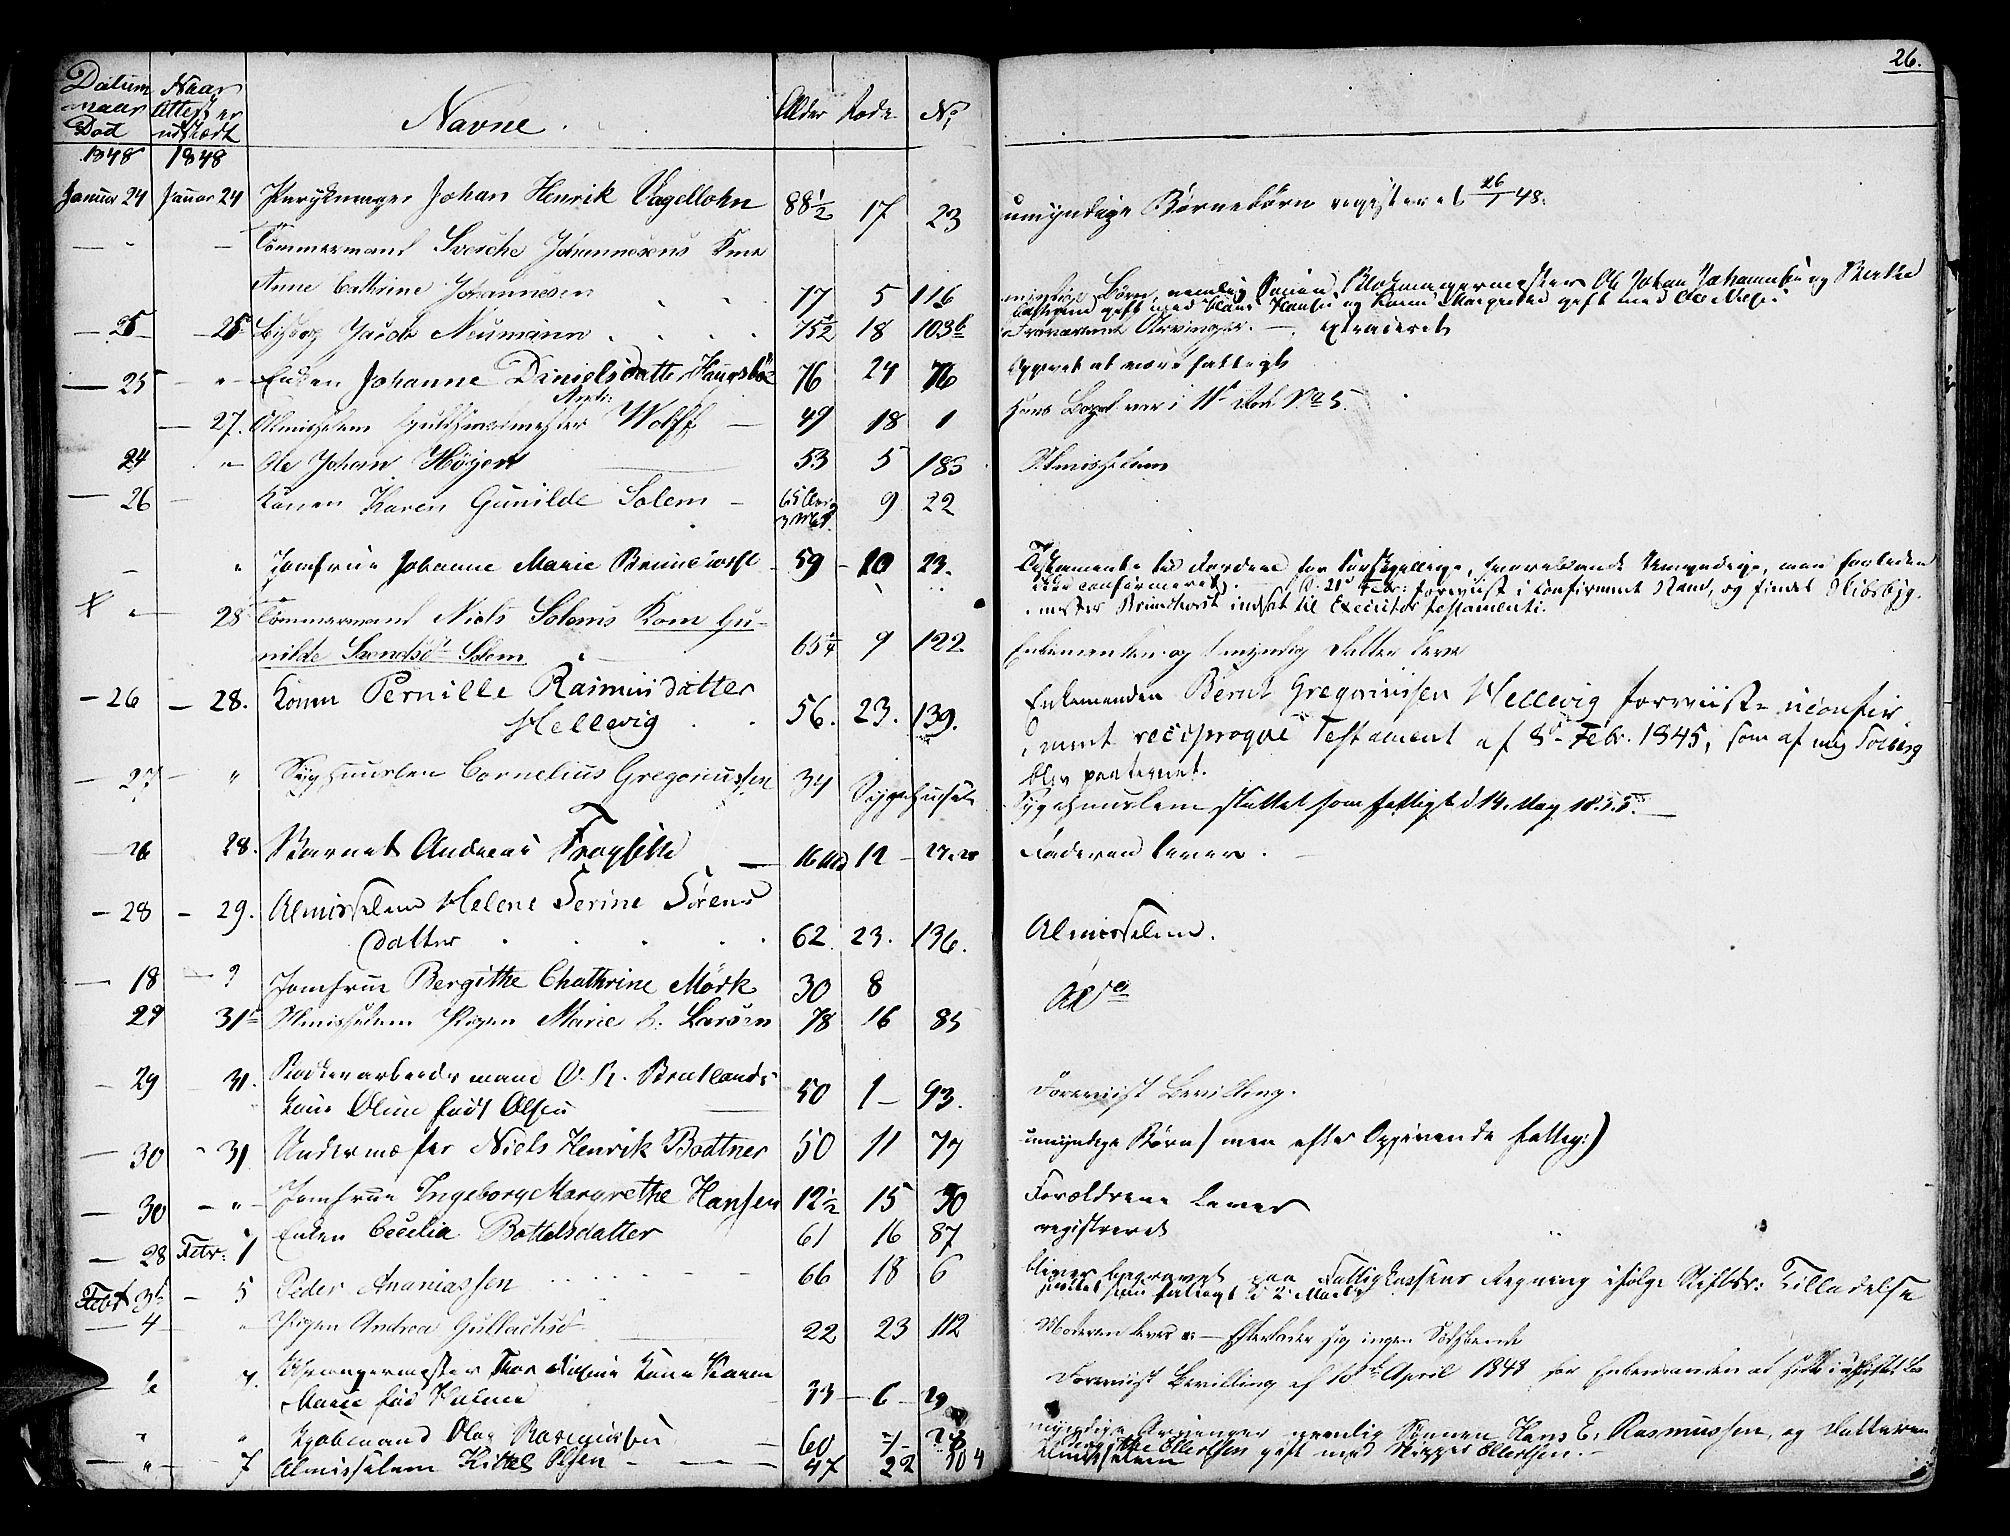 SAB, Byfogd og Byskriver i Bergen, 06/06Na/L0002: Dødsfallsjournaler, 1847-1861, s. 25b-26a